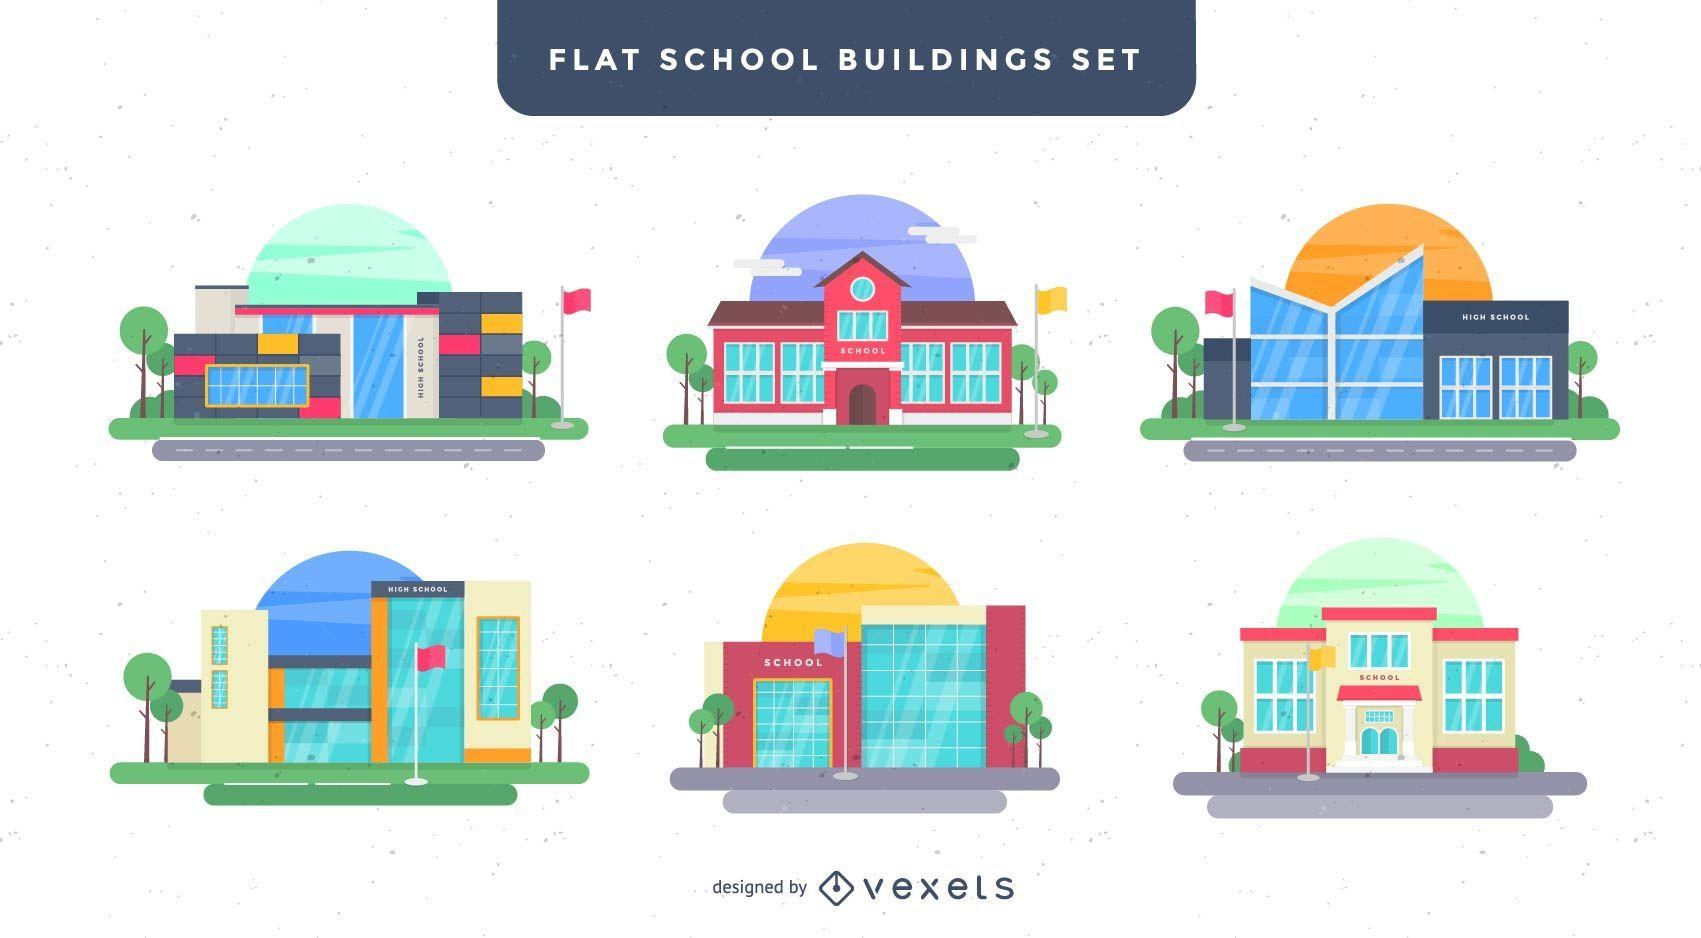 School buildings illustration set